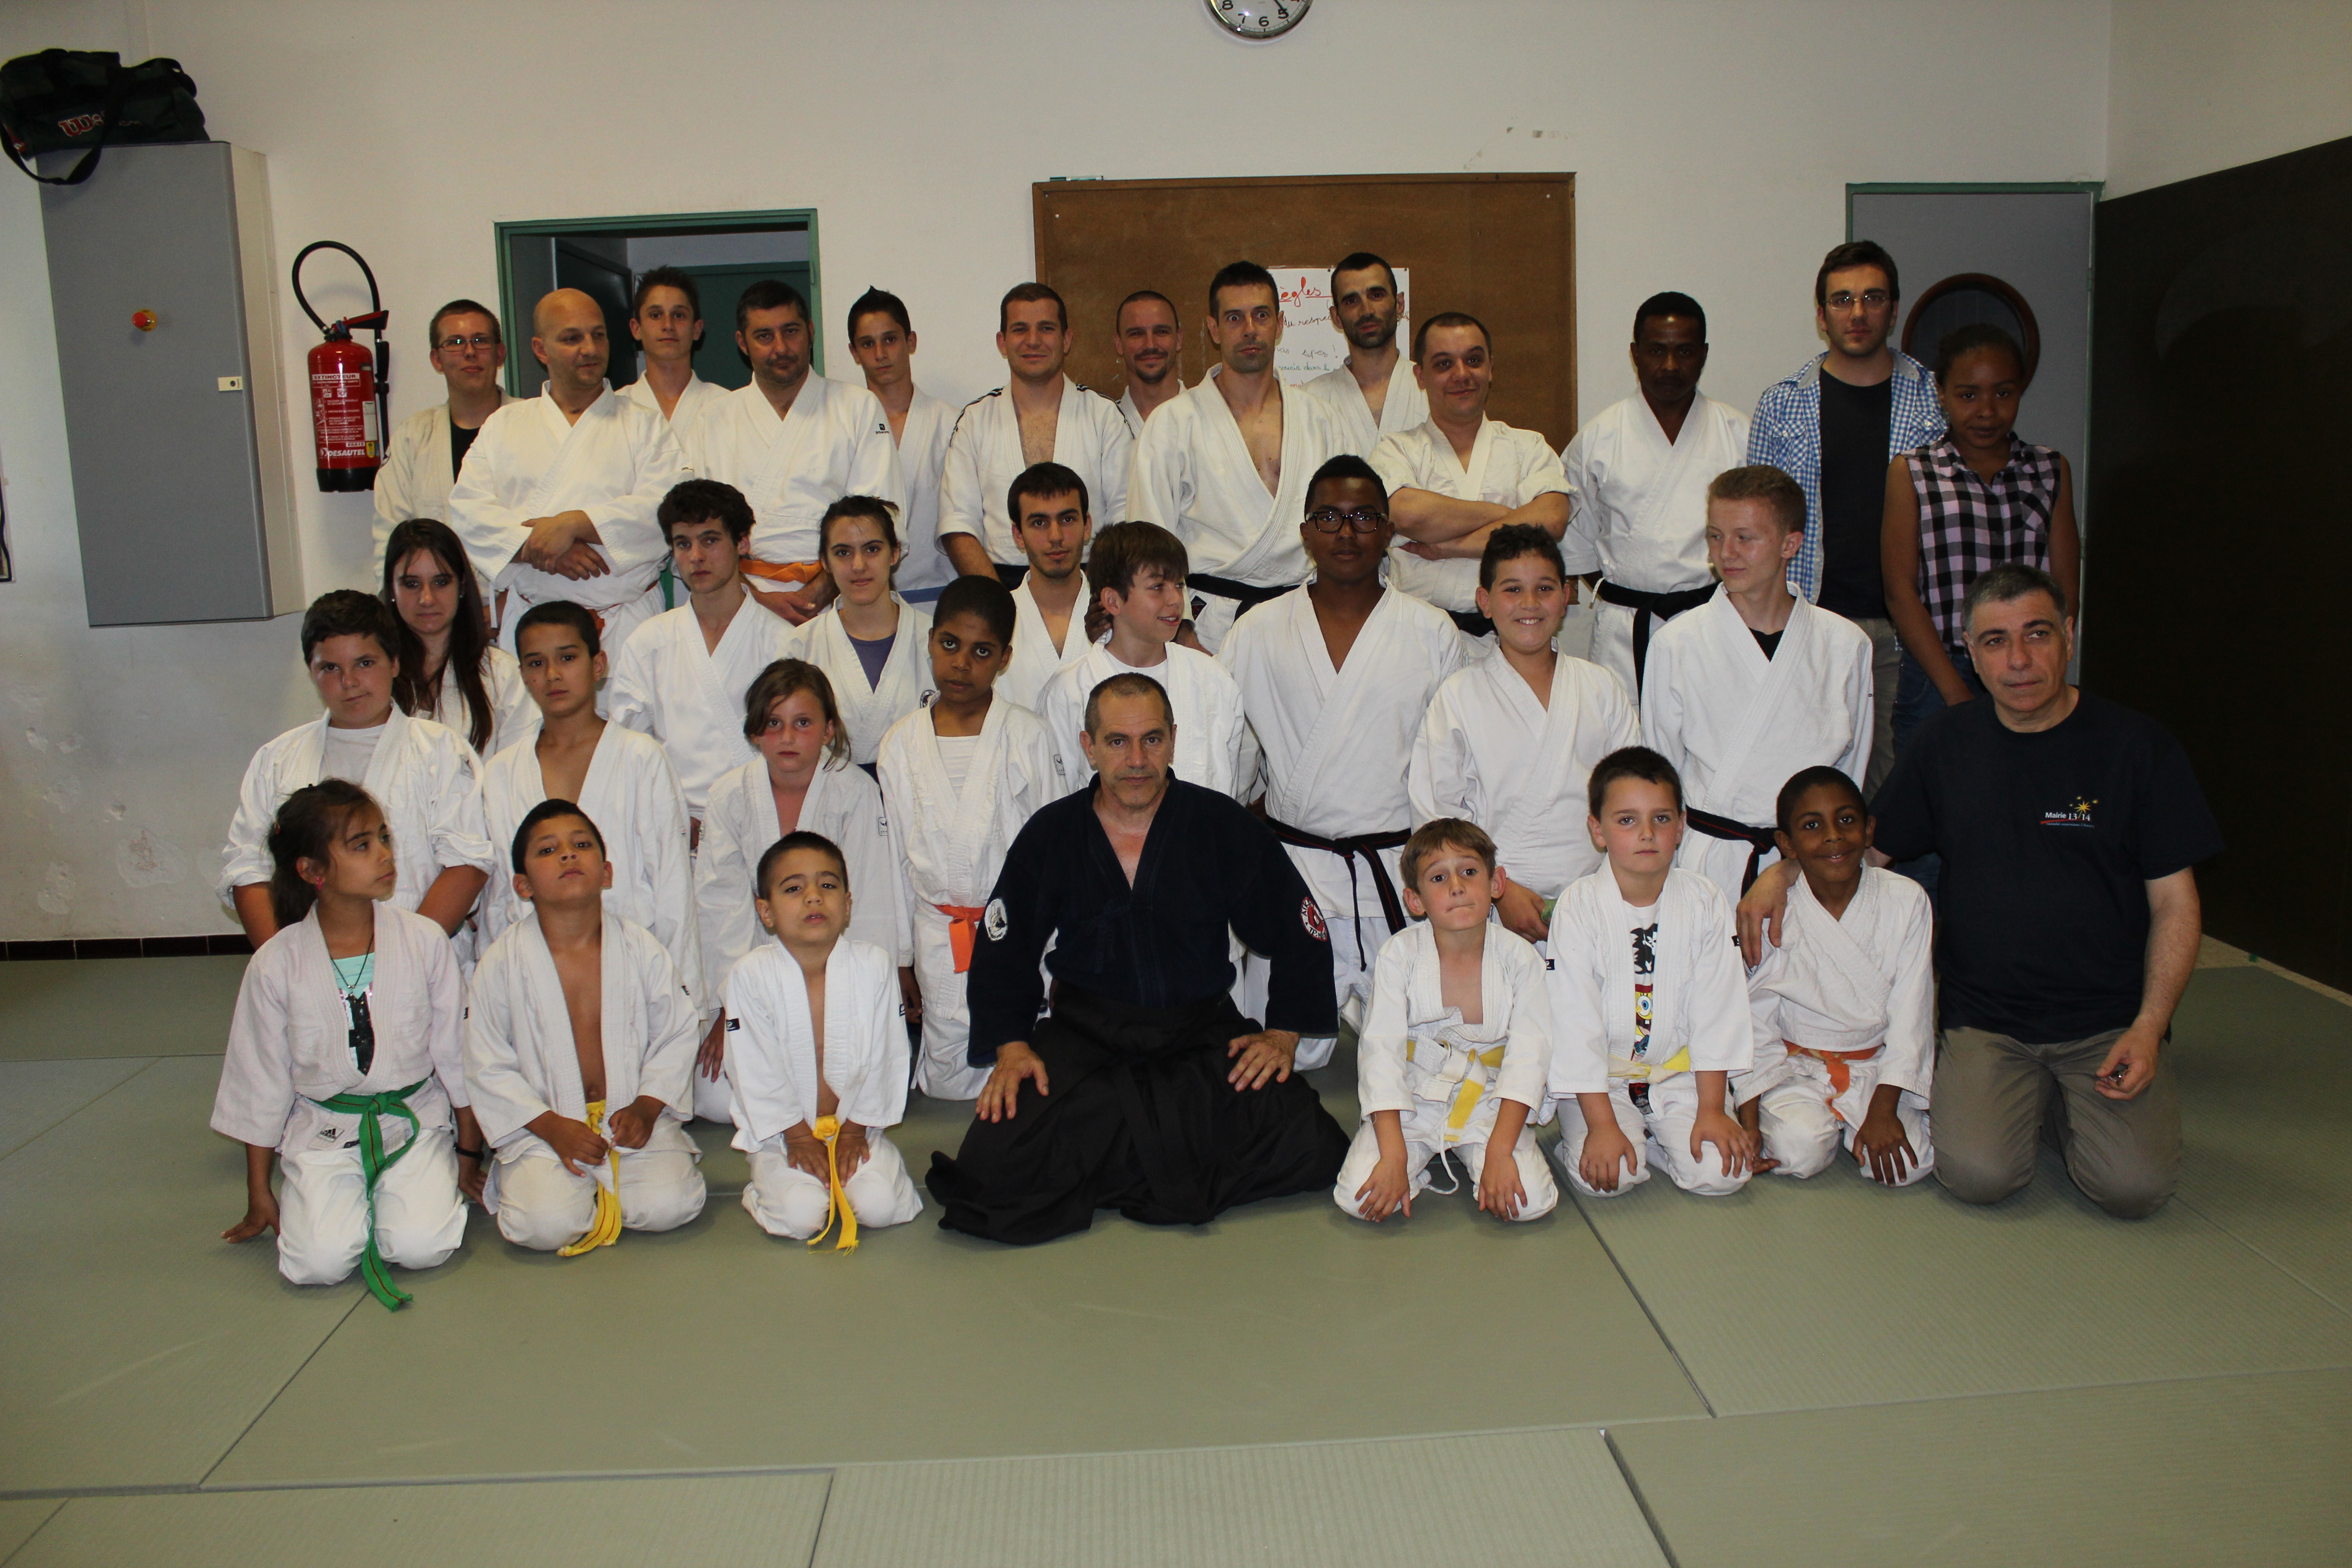 club karate marseille 13013